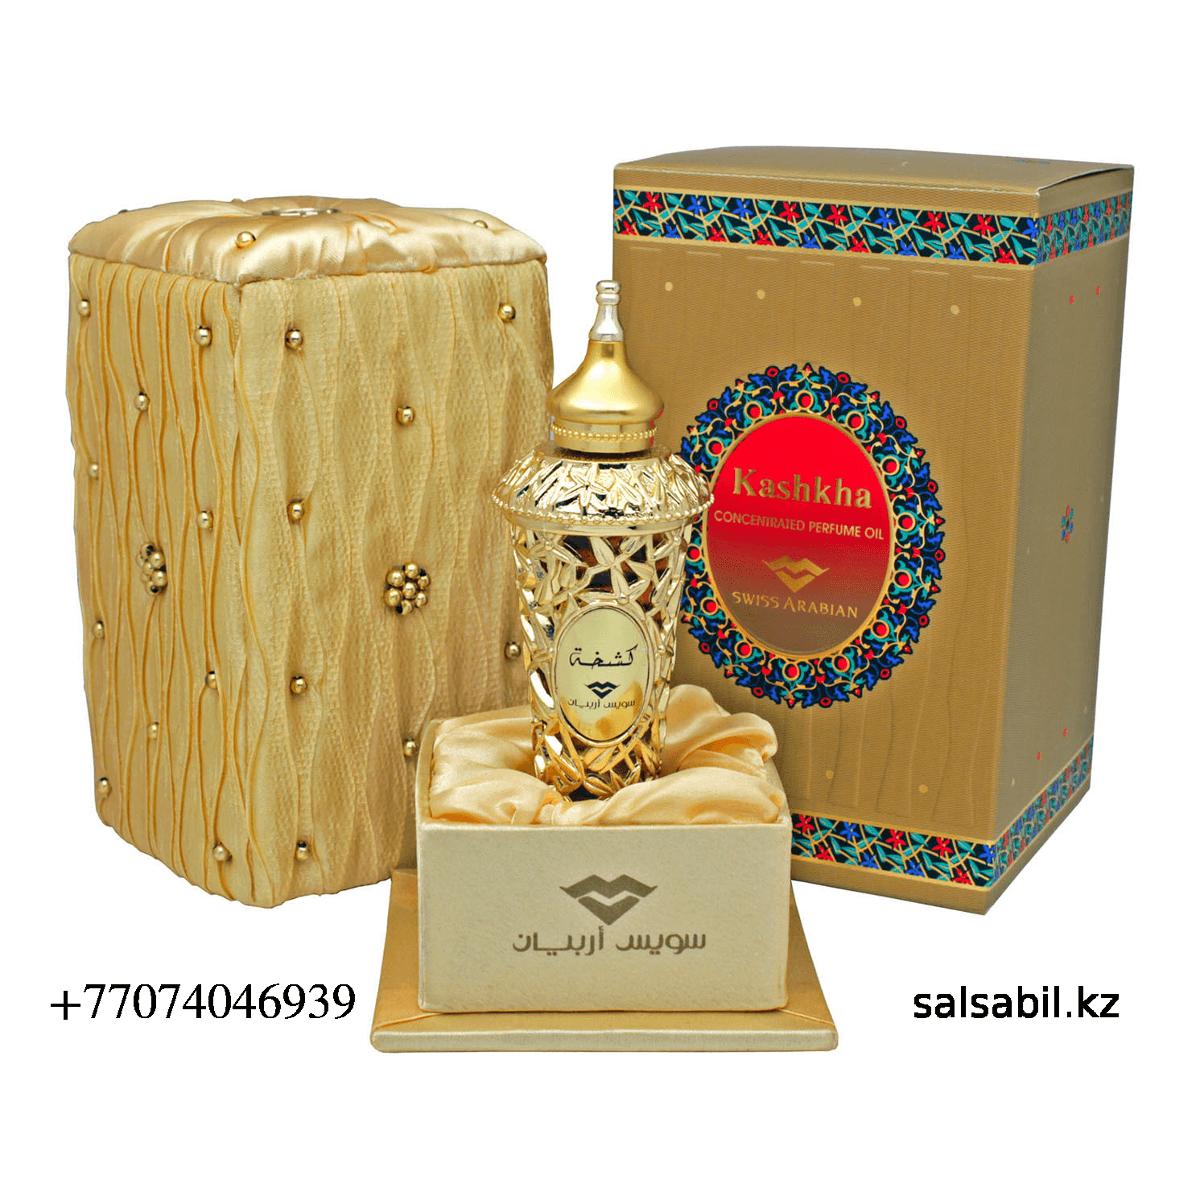 Pure oil perfume Kashkha Swiss Arabian 2